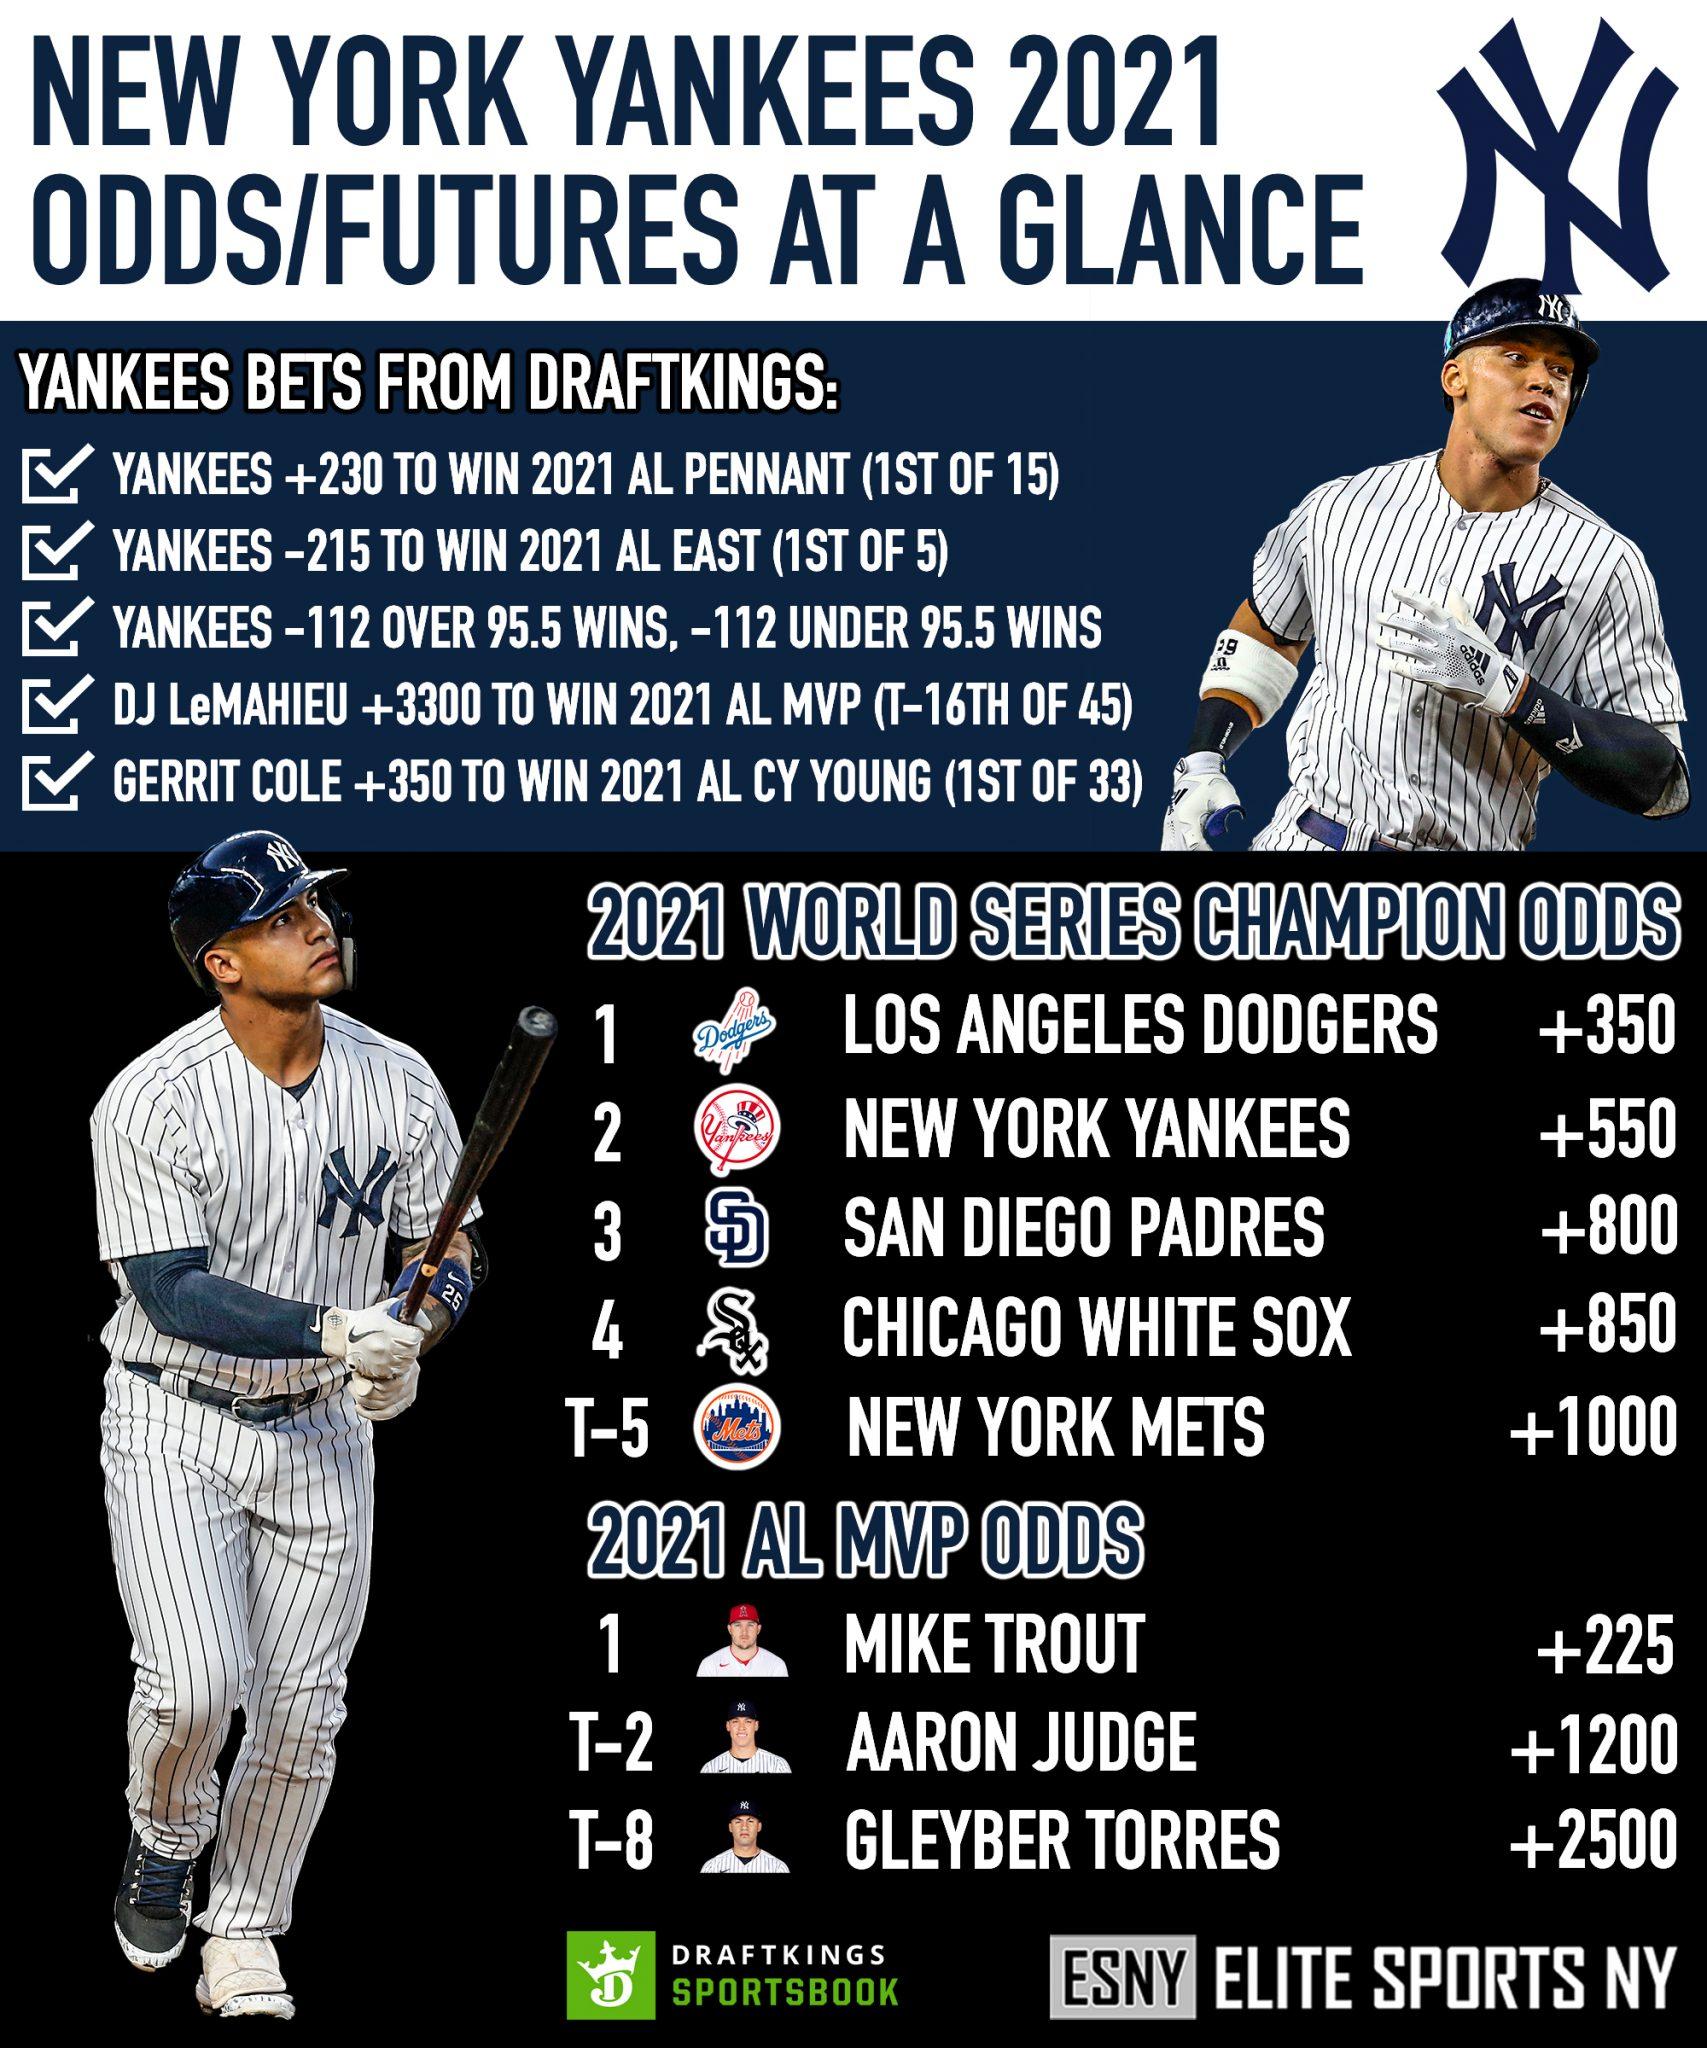 ESNY, New York Yankees, DraftKings Sportsbook, MLB Futures, 2021 Odds